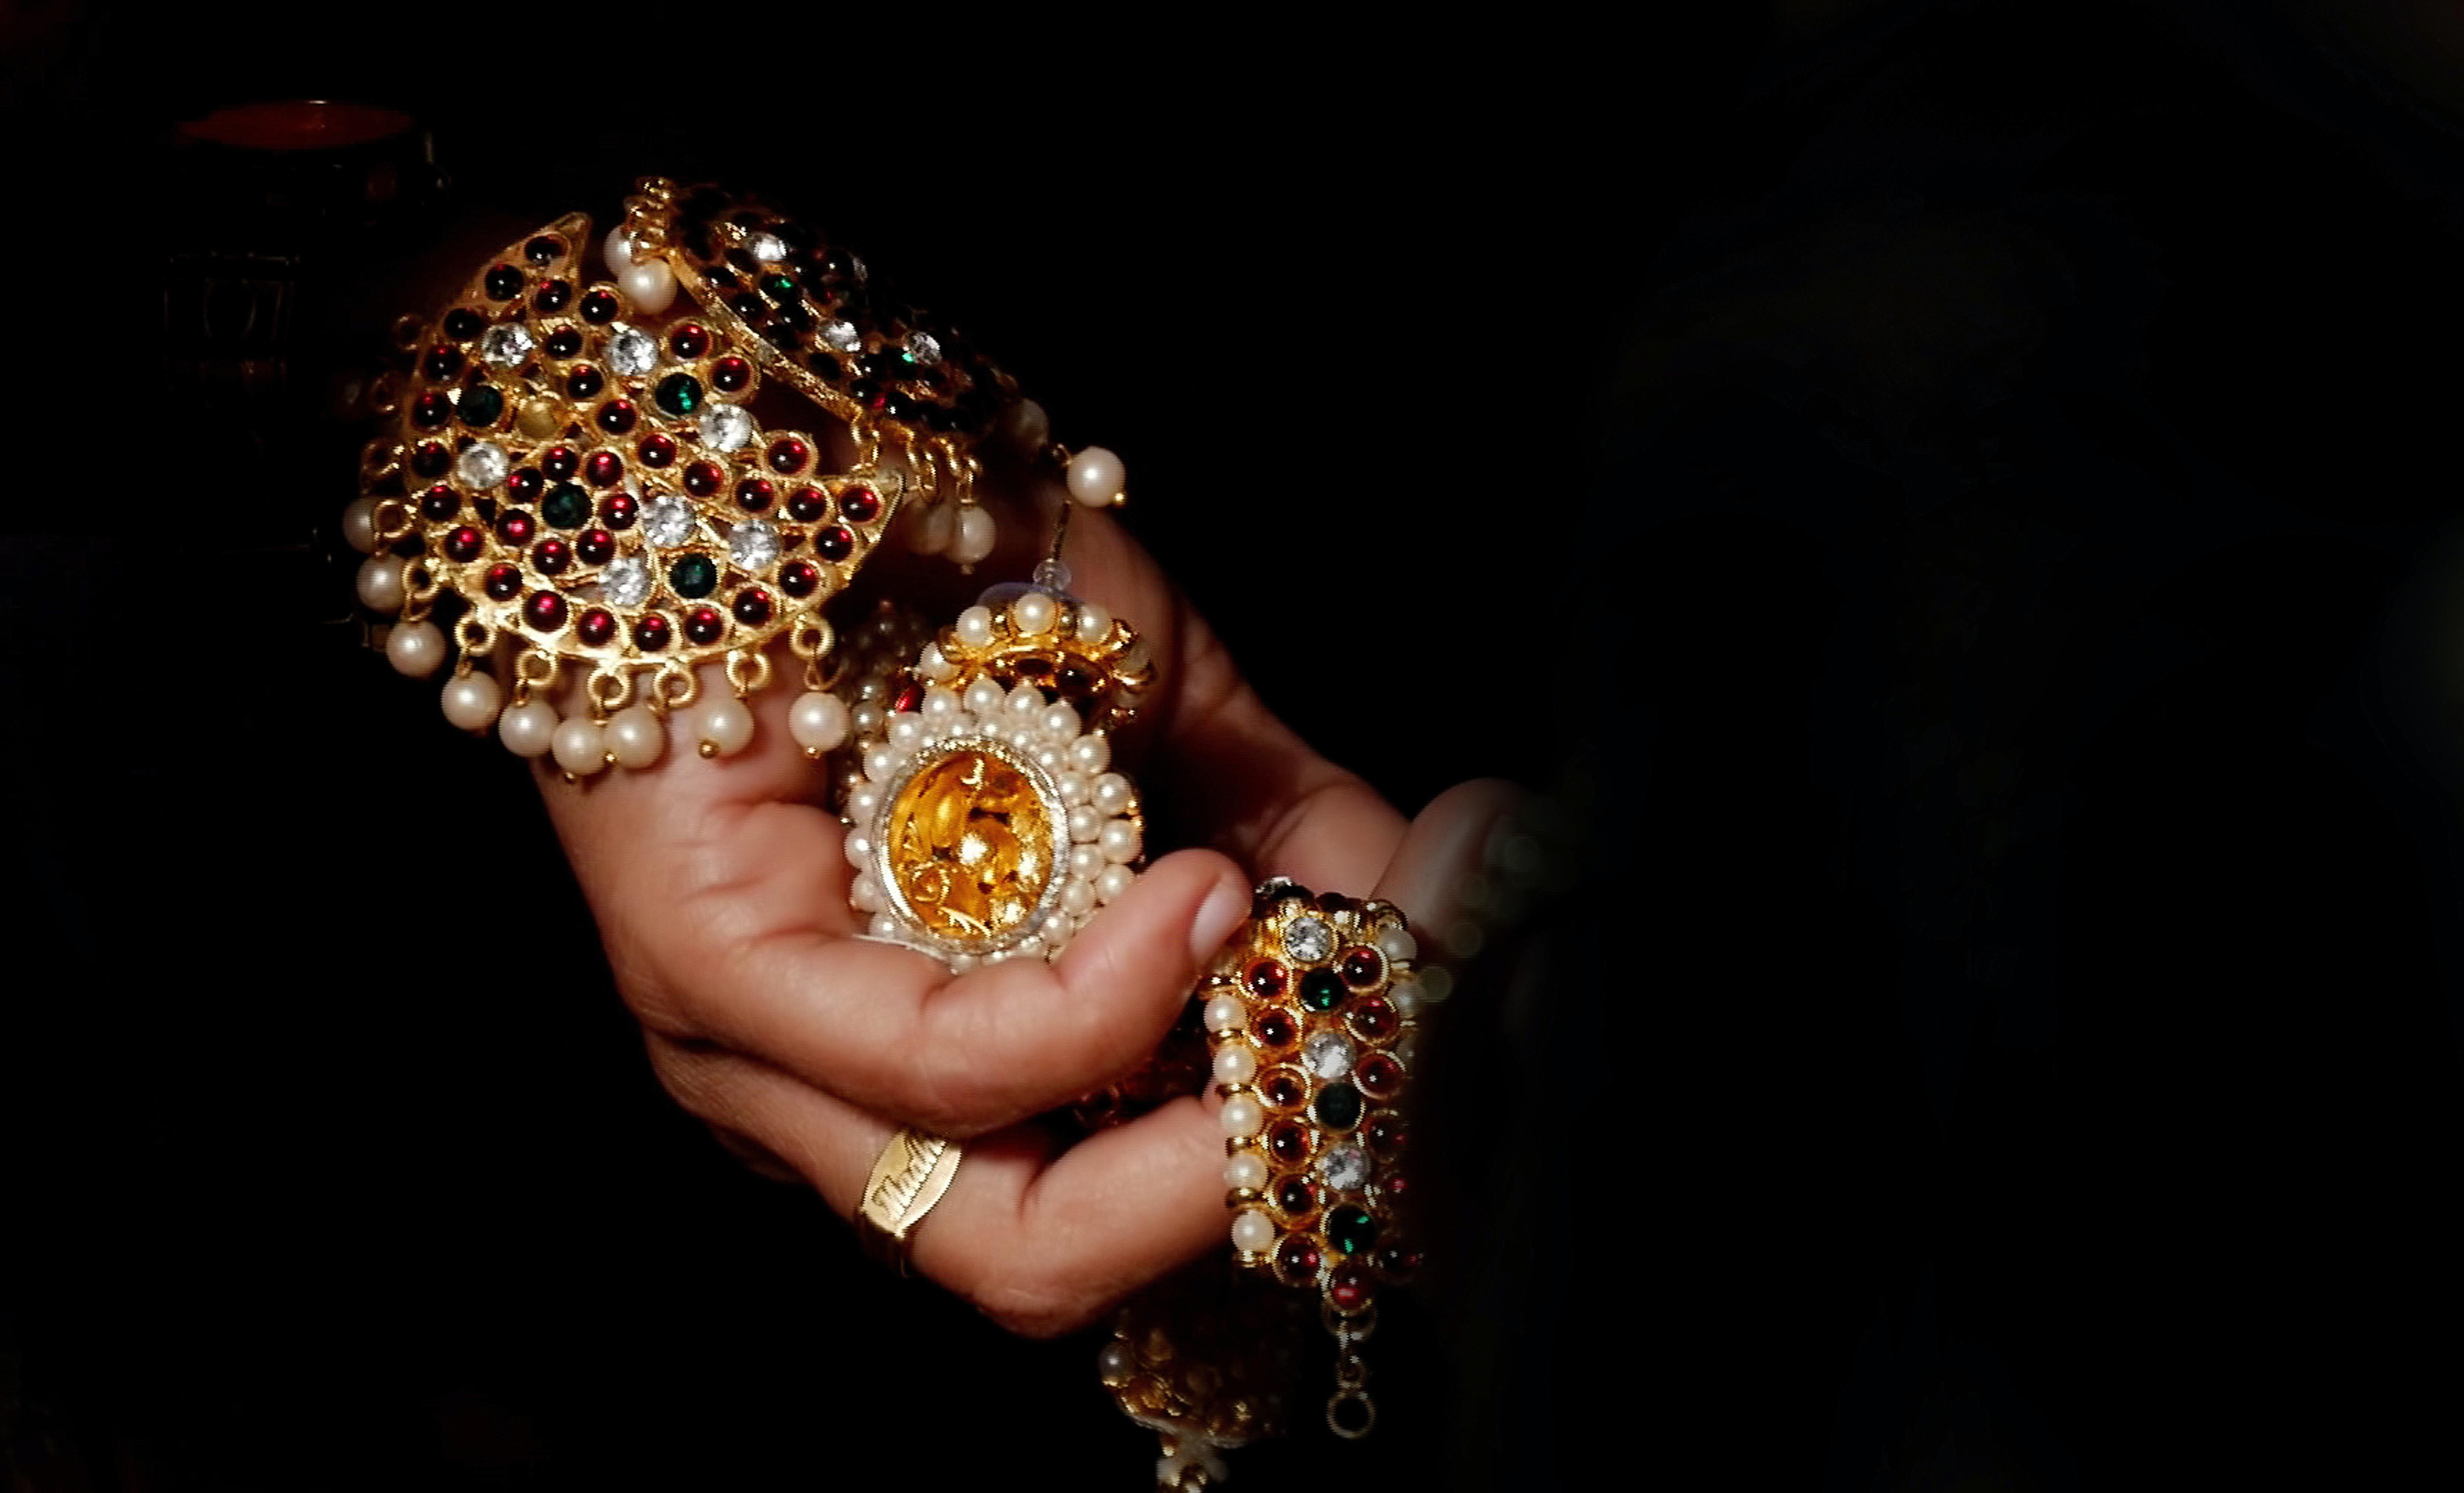 200+ Gorgeous Jewellery Images · Pexels · Free Stock Photos